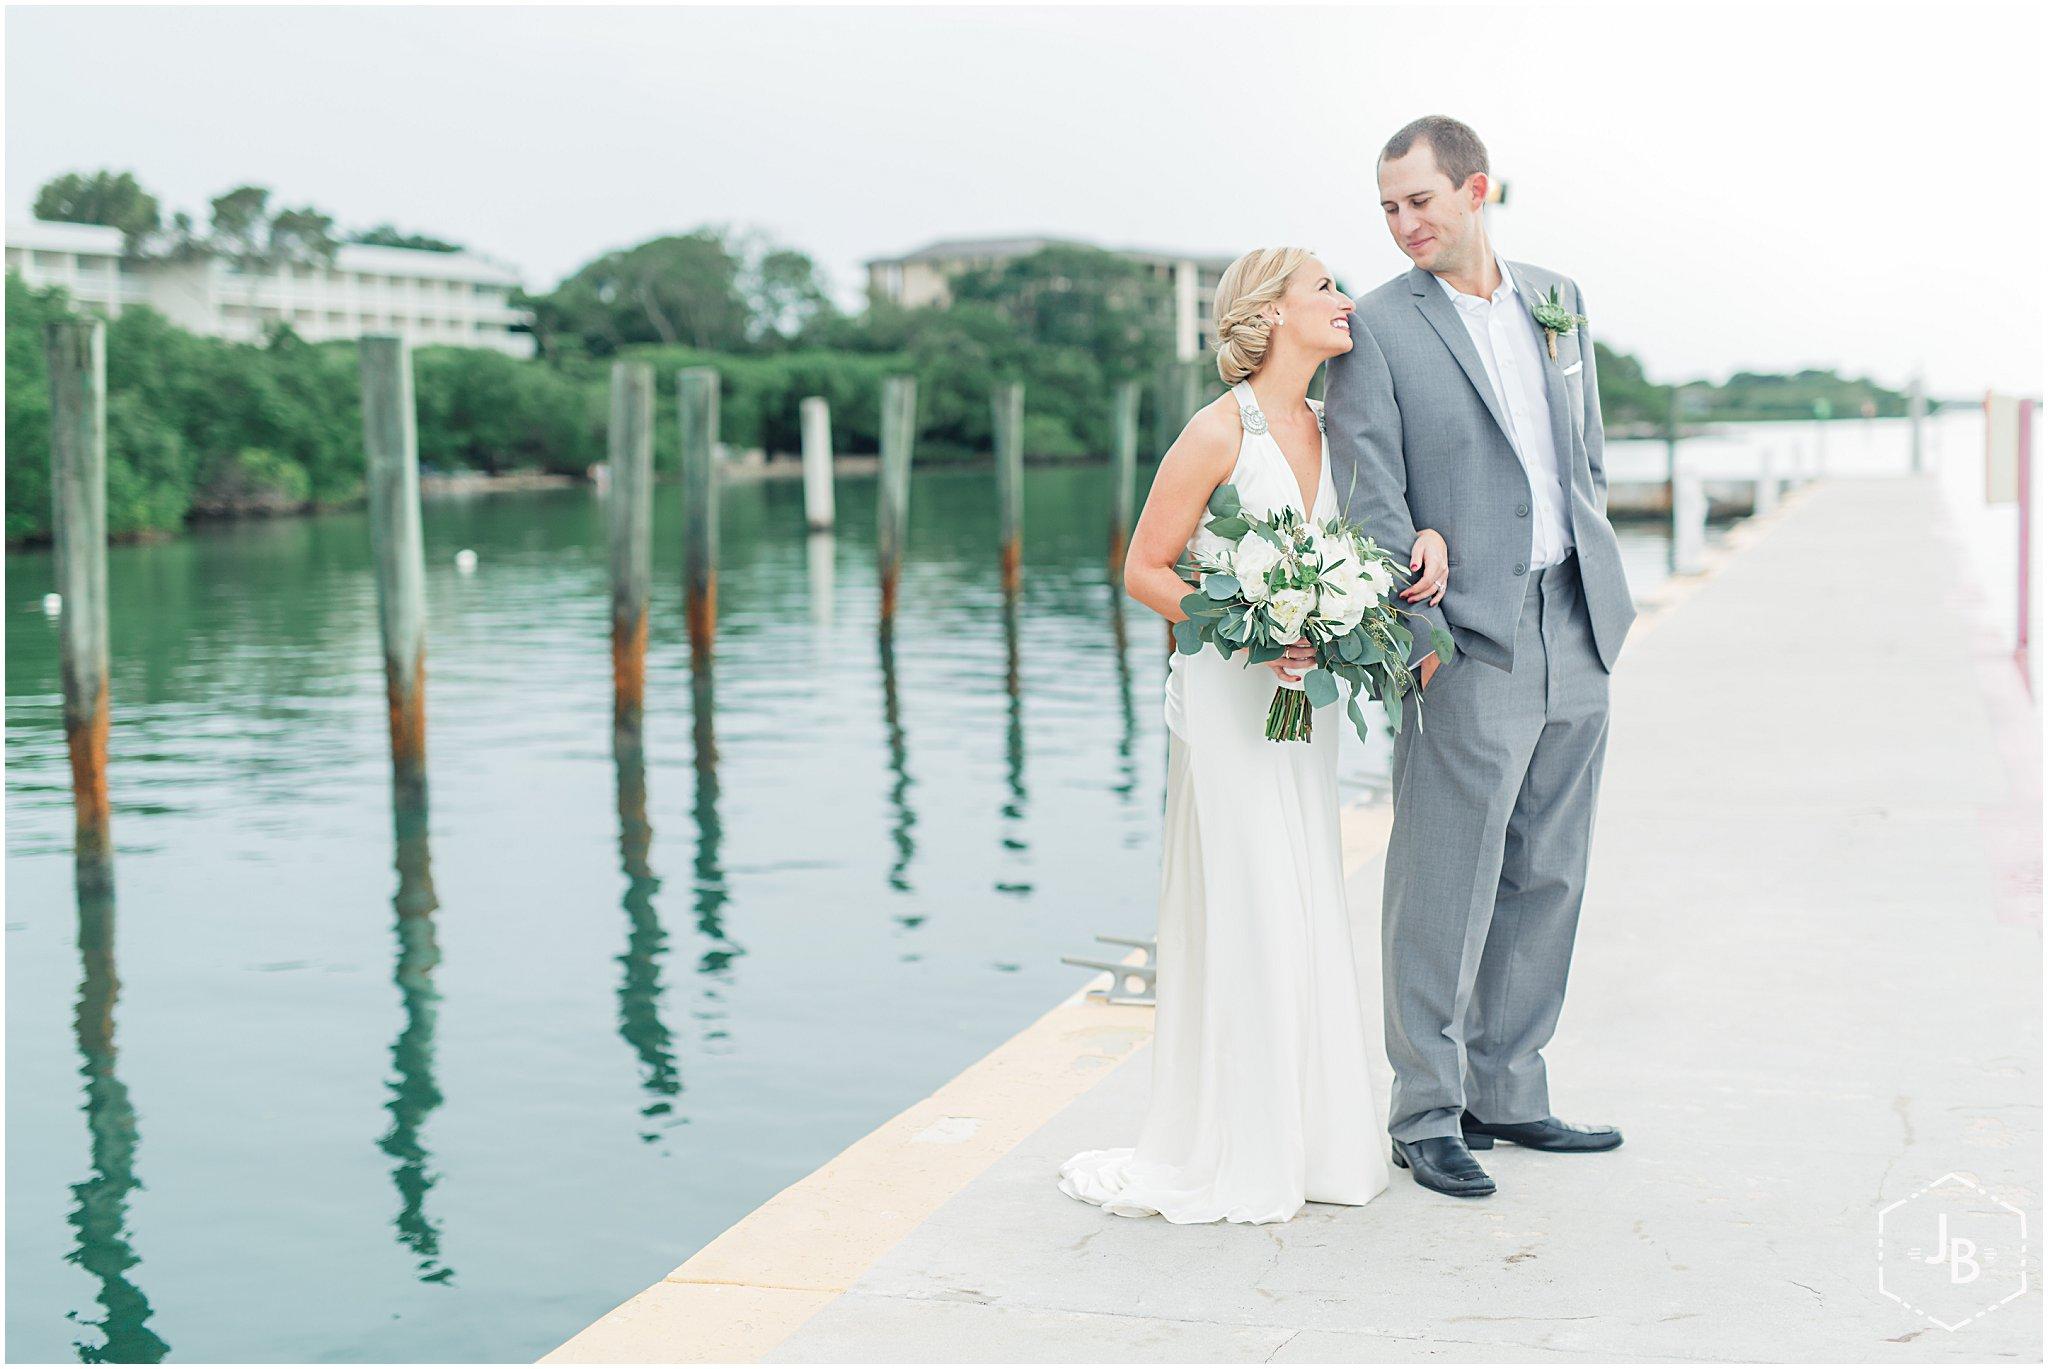 WeddingandEngagementFloridaPhotographer_1116.jpg